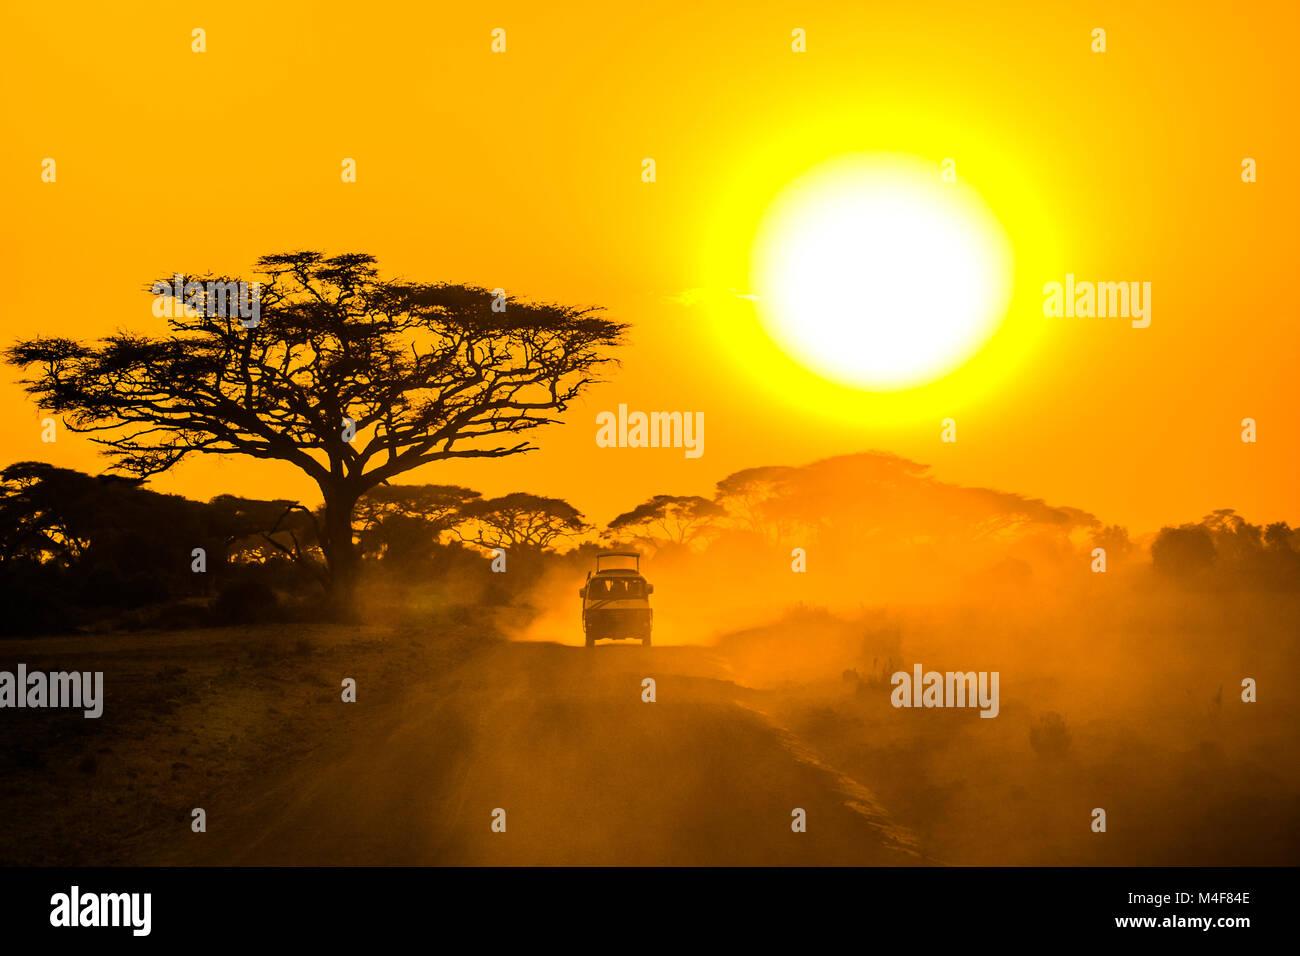 safari jeep driving through savannah in the sunset - Stock Image